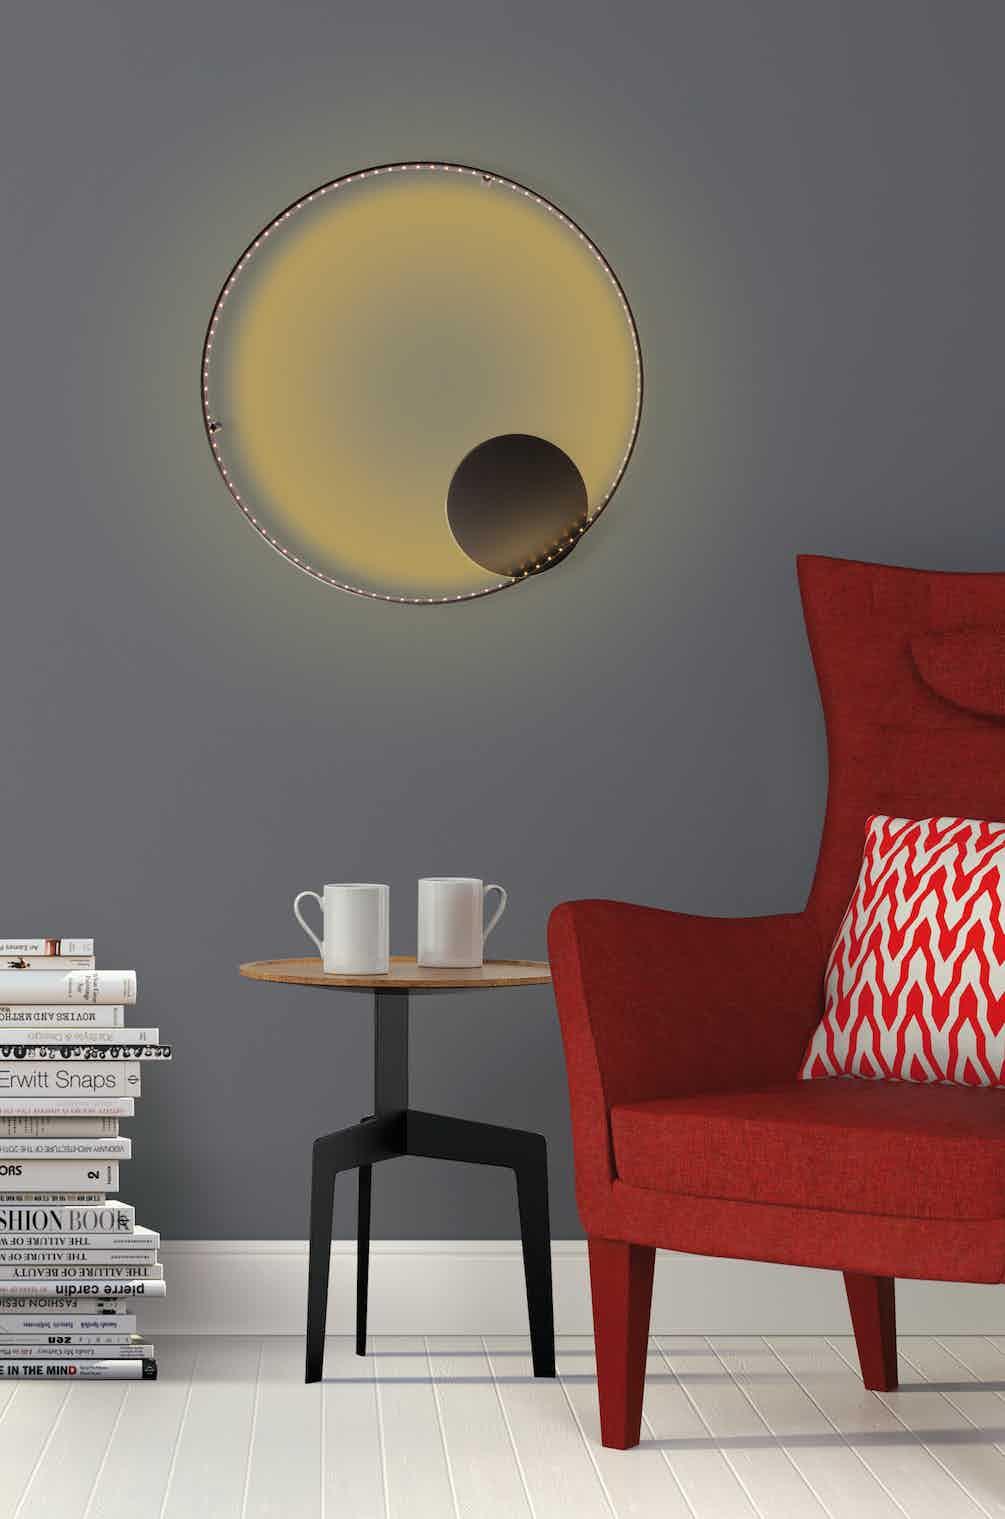 Le-deun-luminaires-curve-60-wall-lamp-black-insitu-haute-living